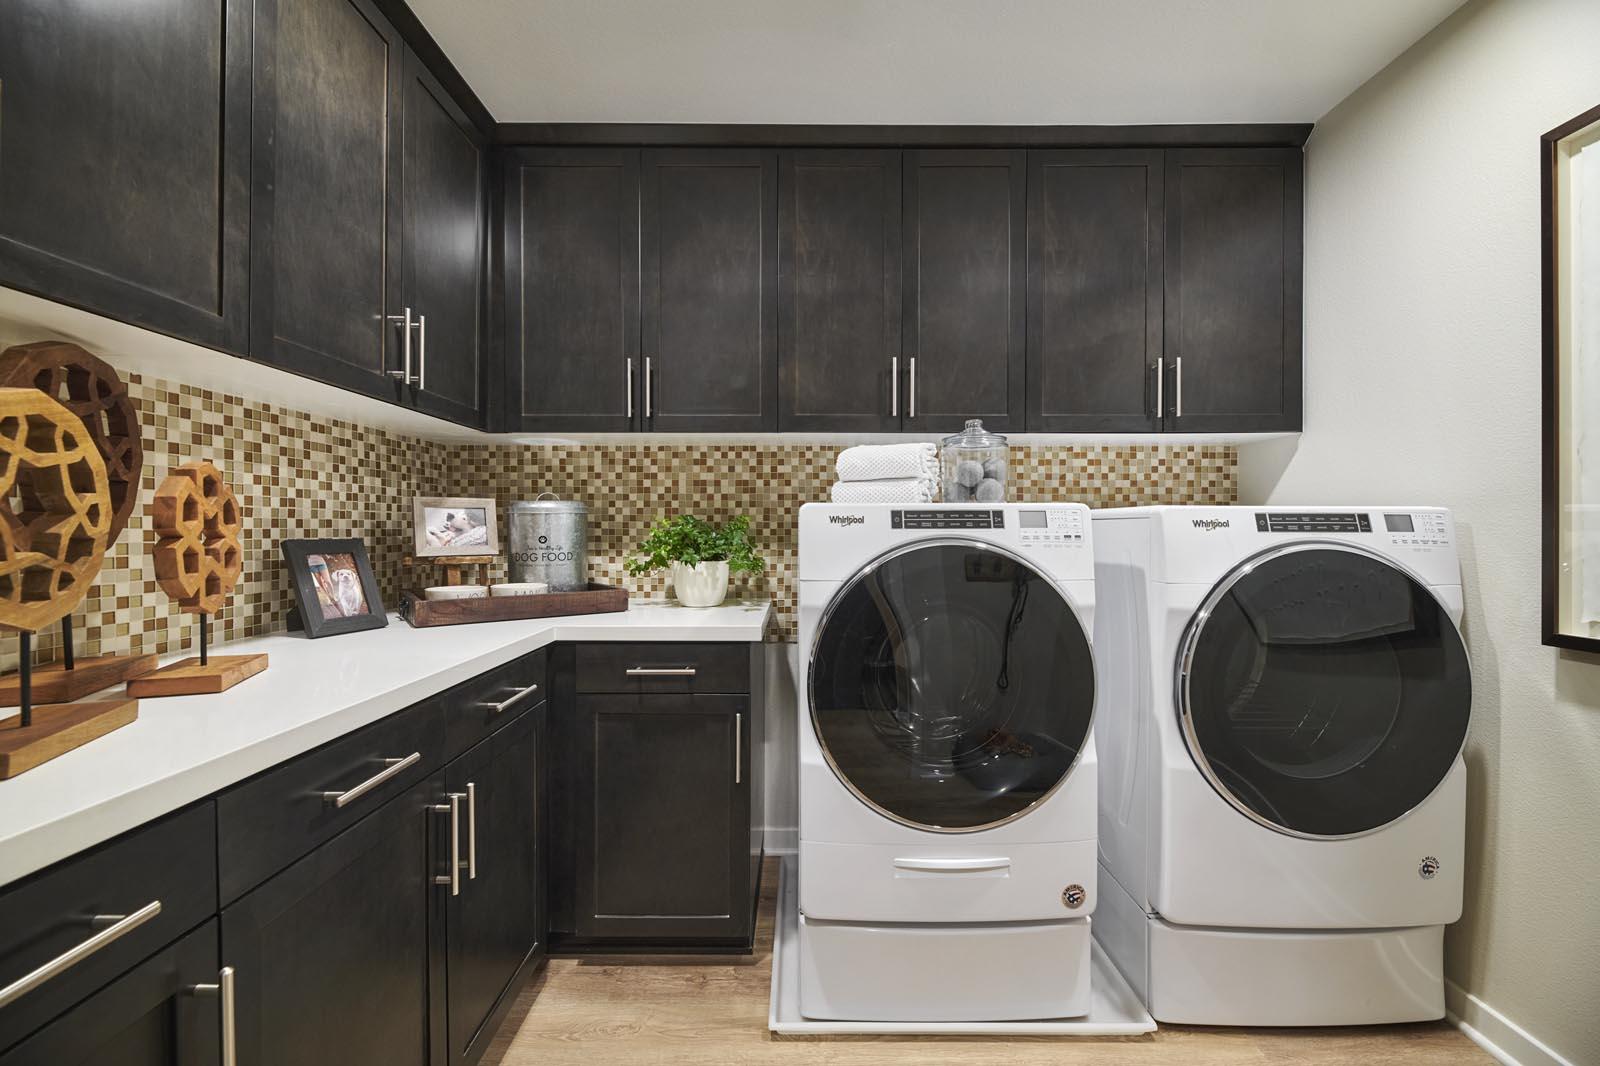 Laundry Room | Residence 5 | Aspire | New Homes in Rancho Cucamonga, CA | Van Daele Homes